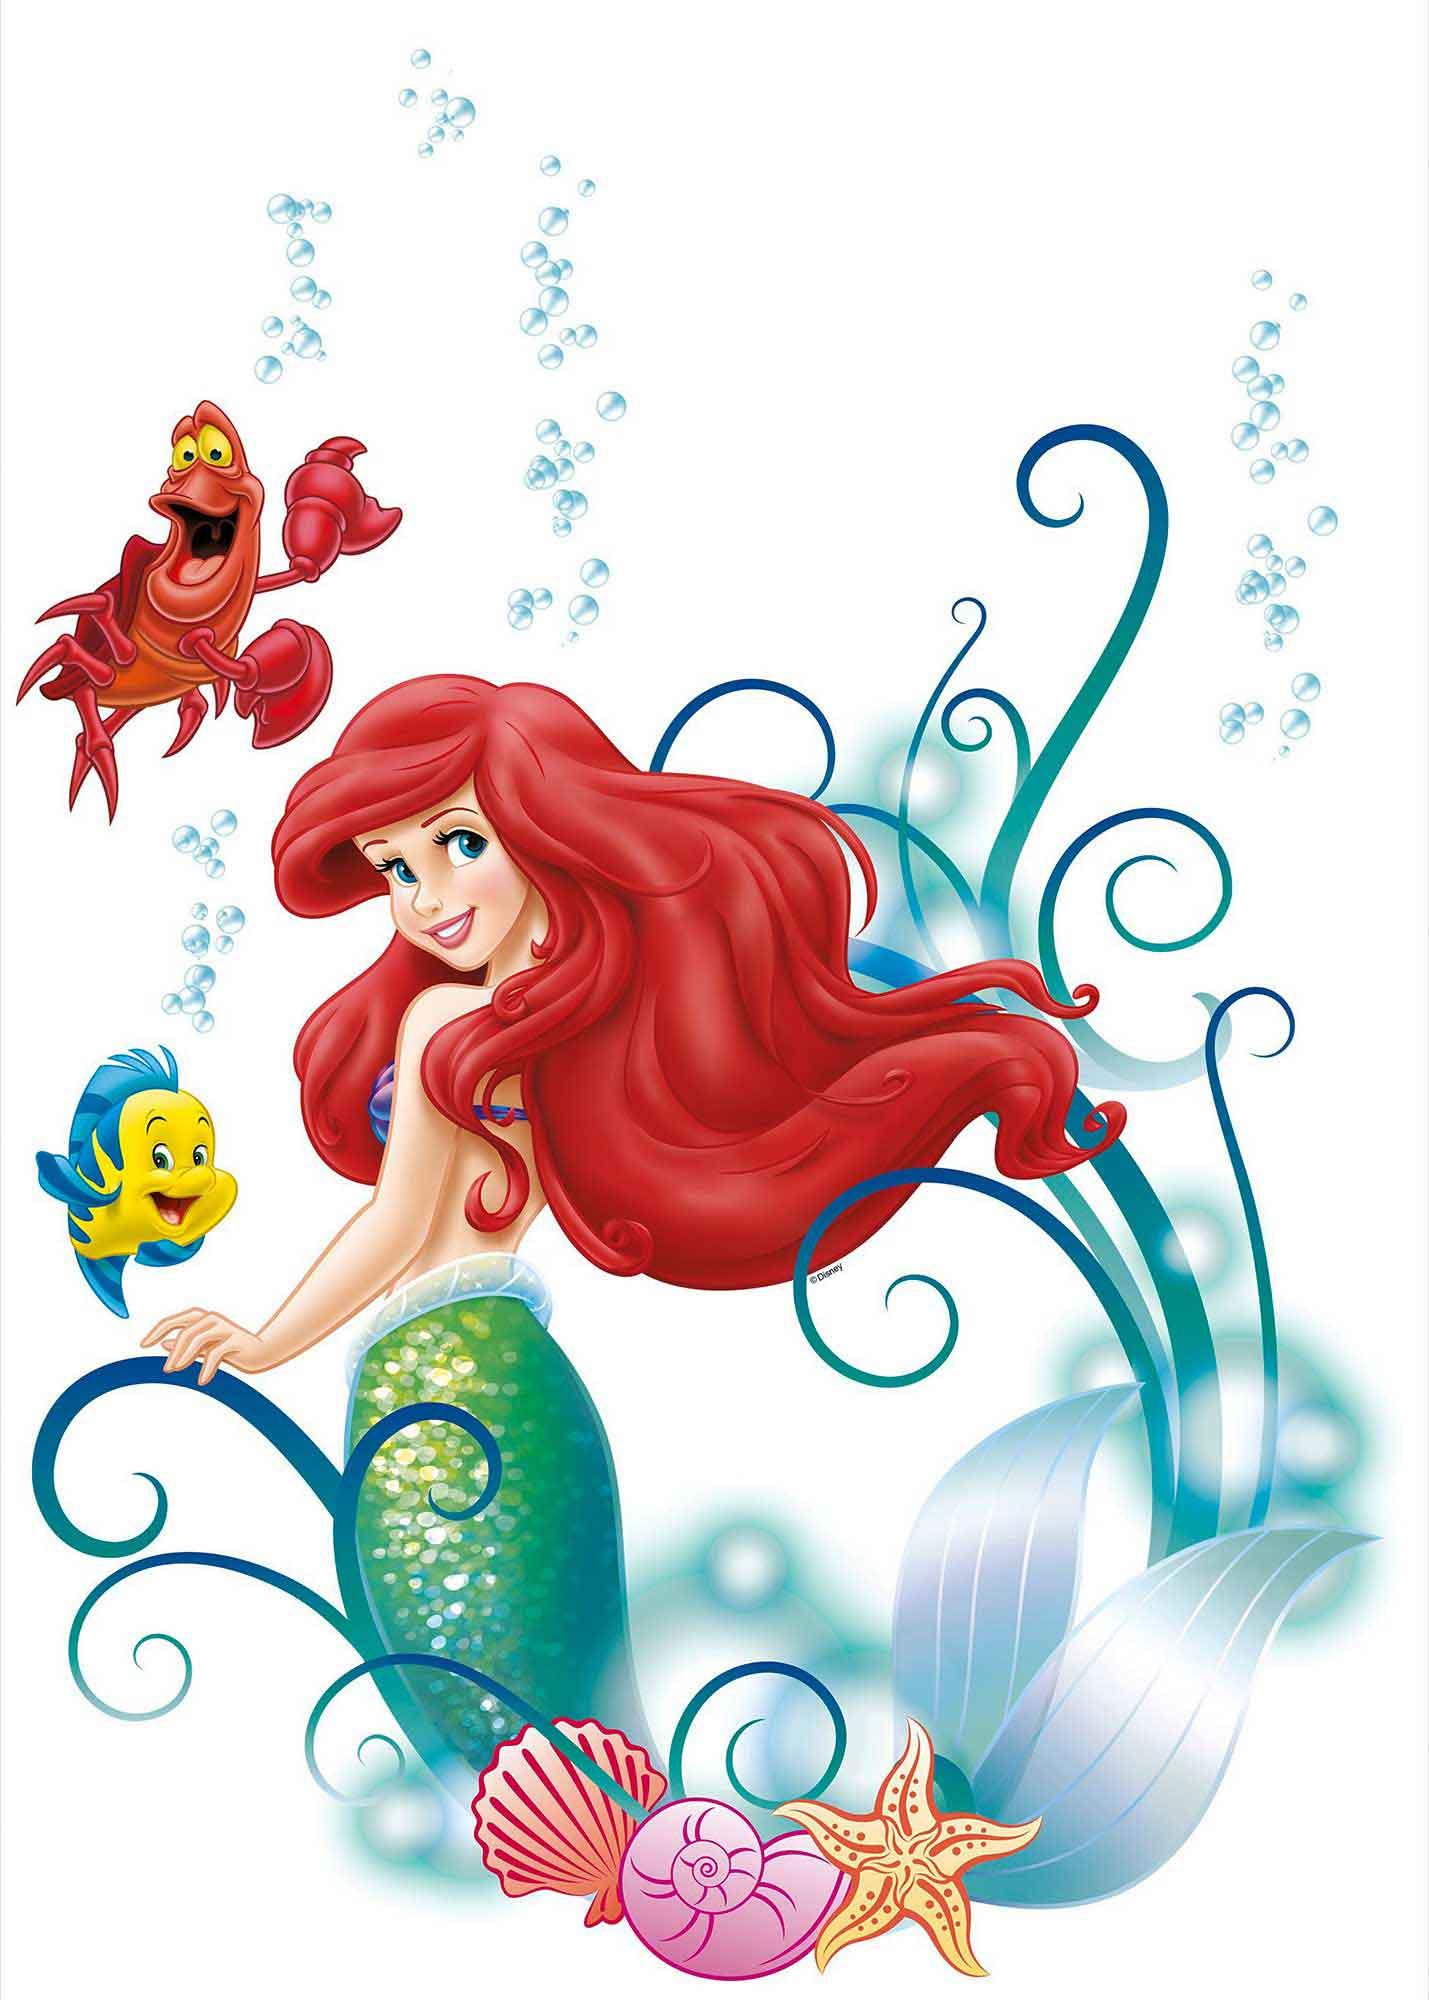 Wandsticker disney princess arielle disney princess - Wandsticker disney ...